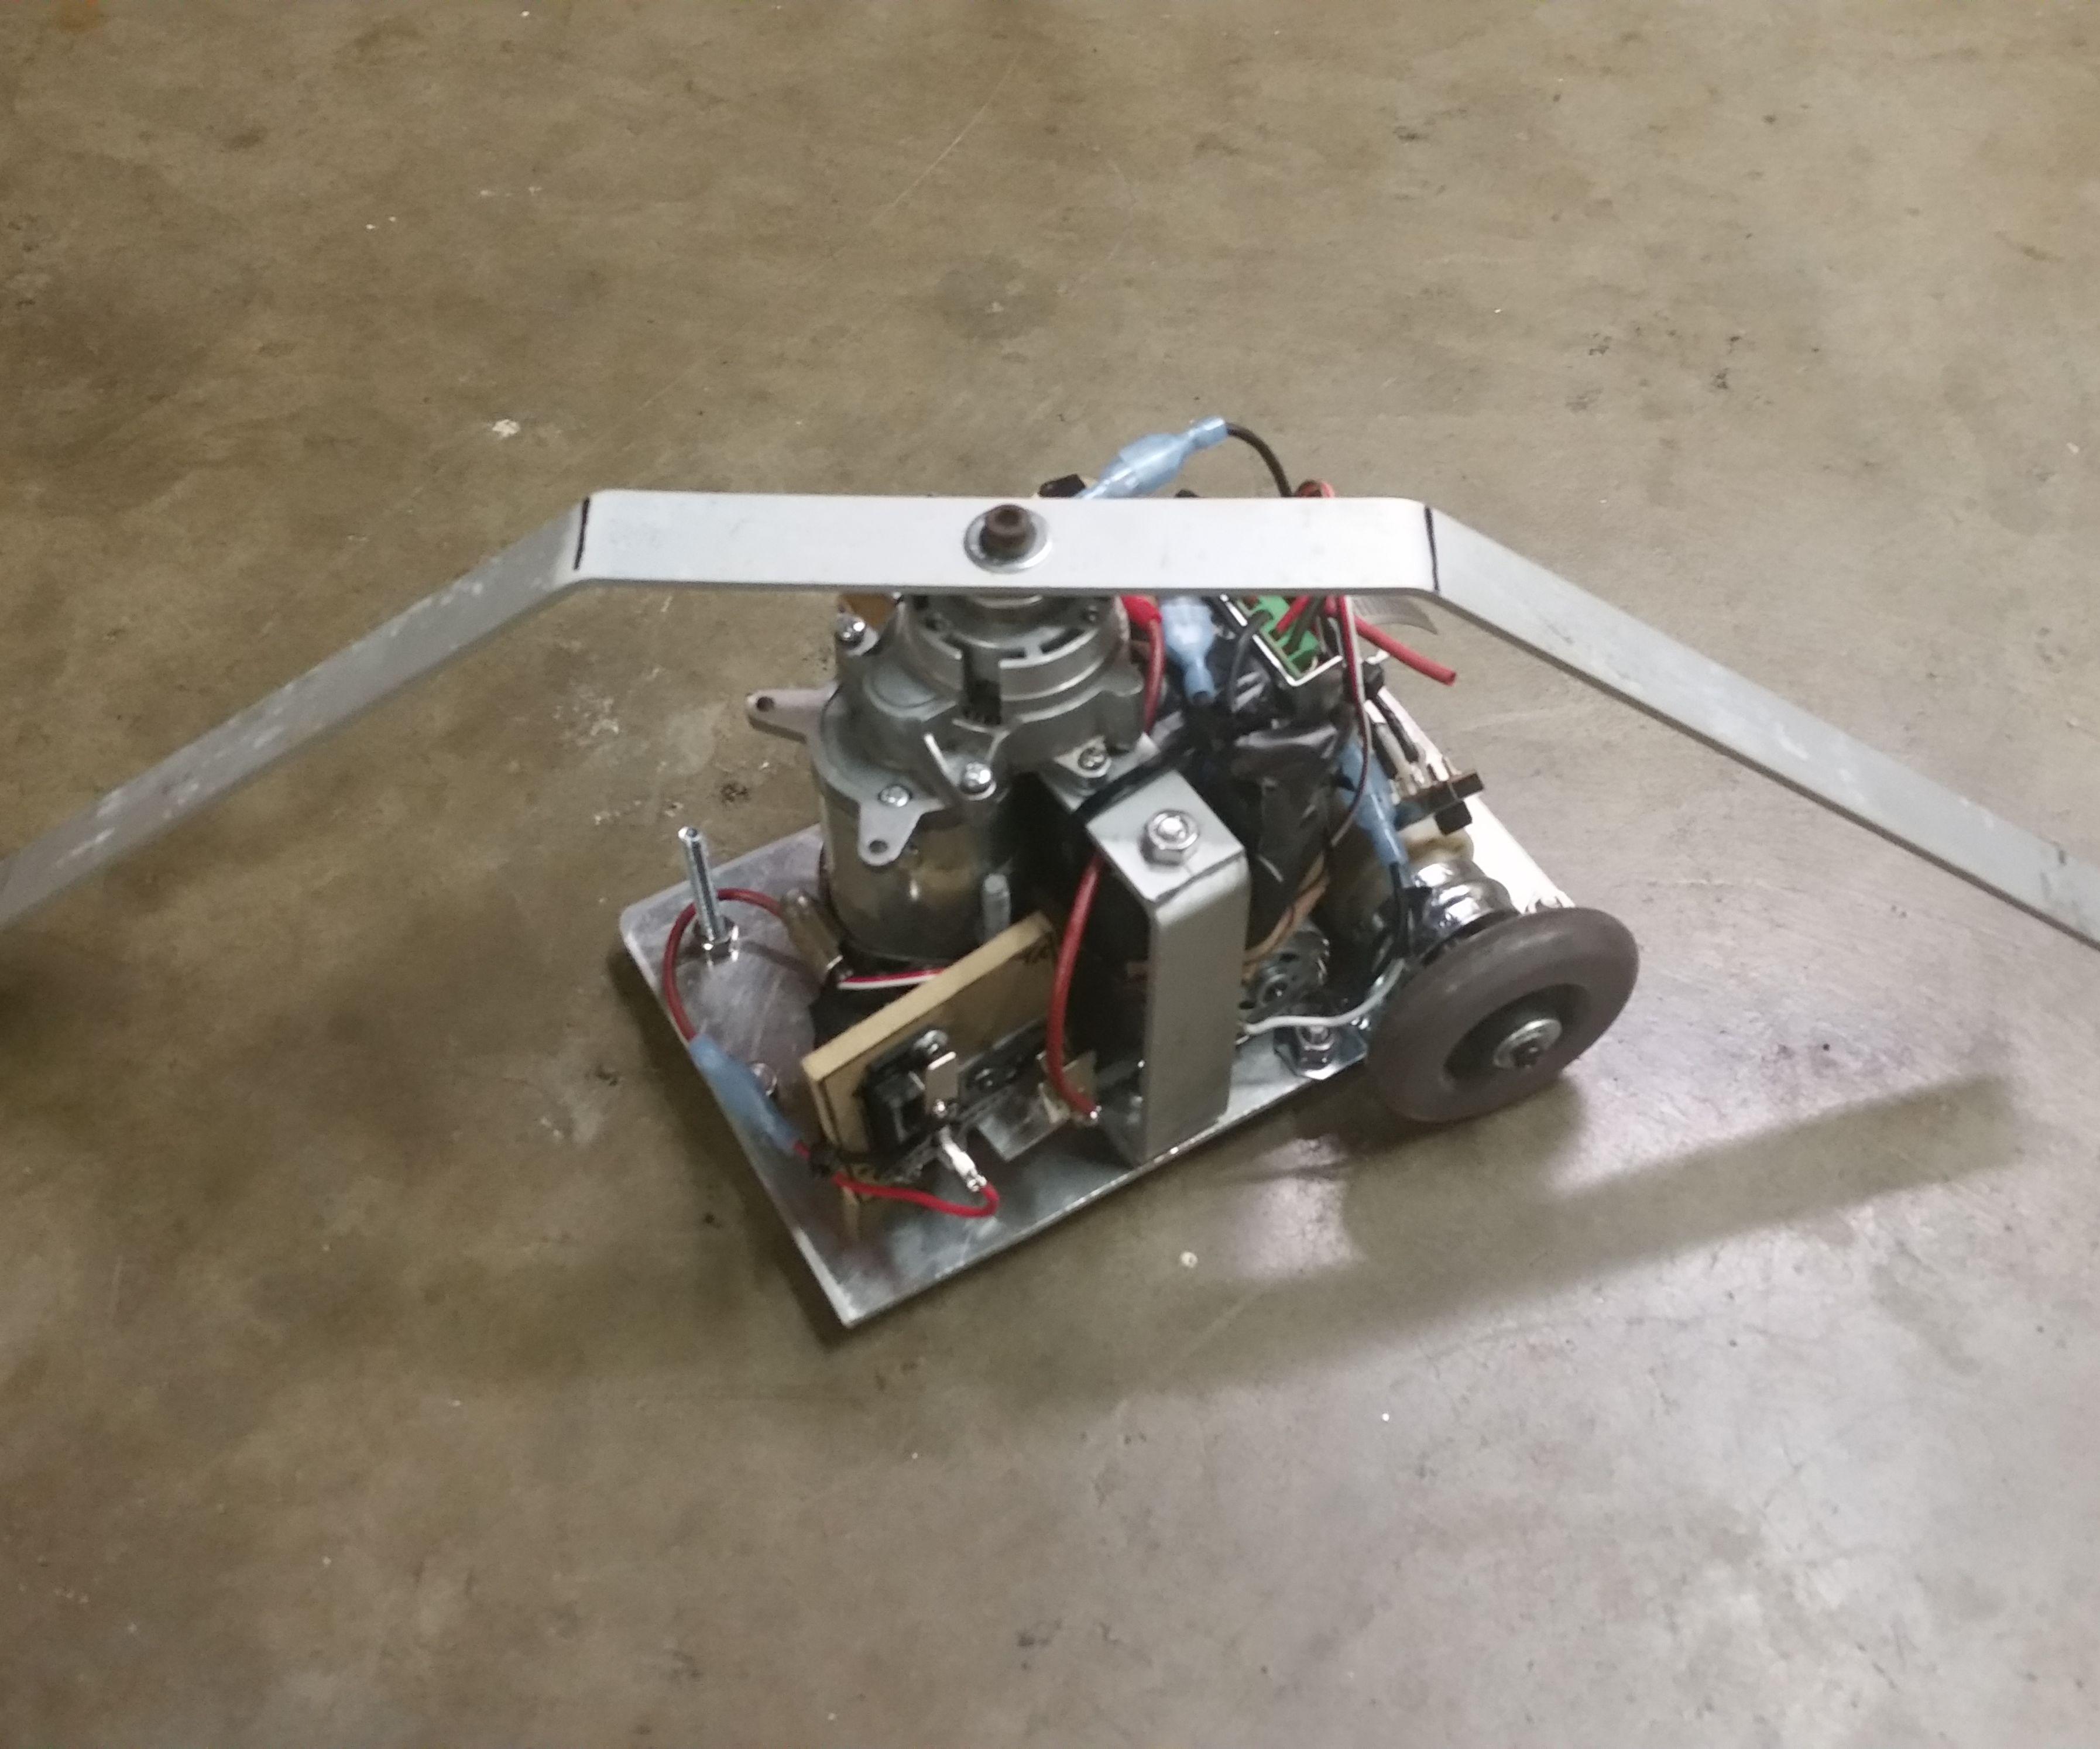 Combat Robot for Under $250